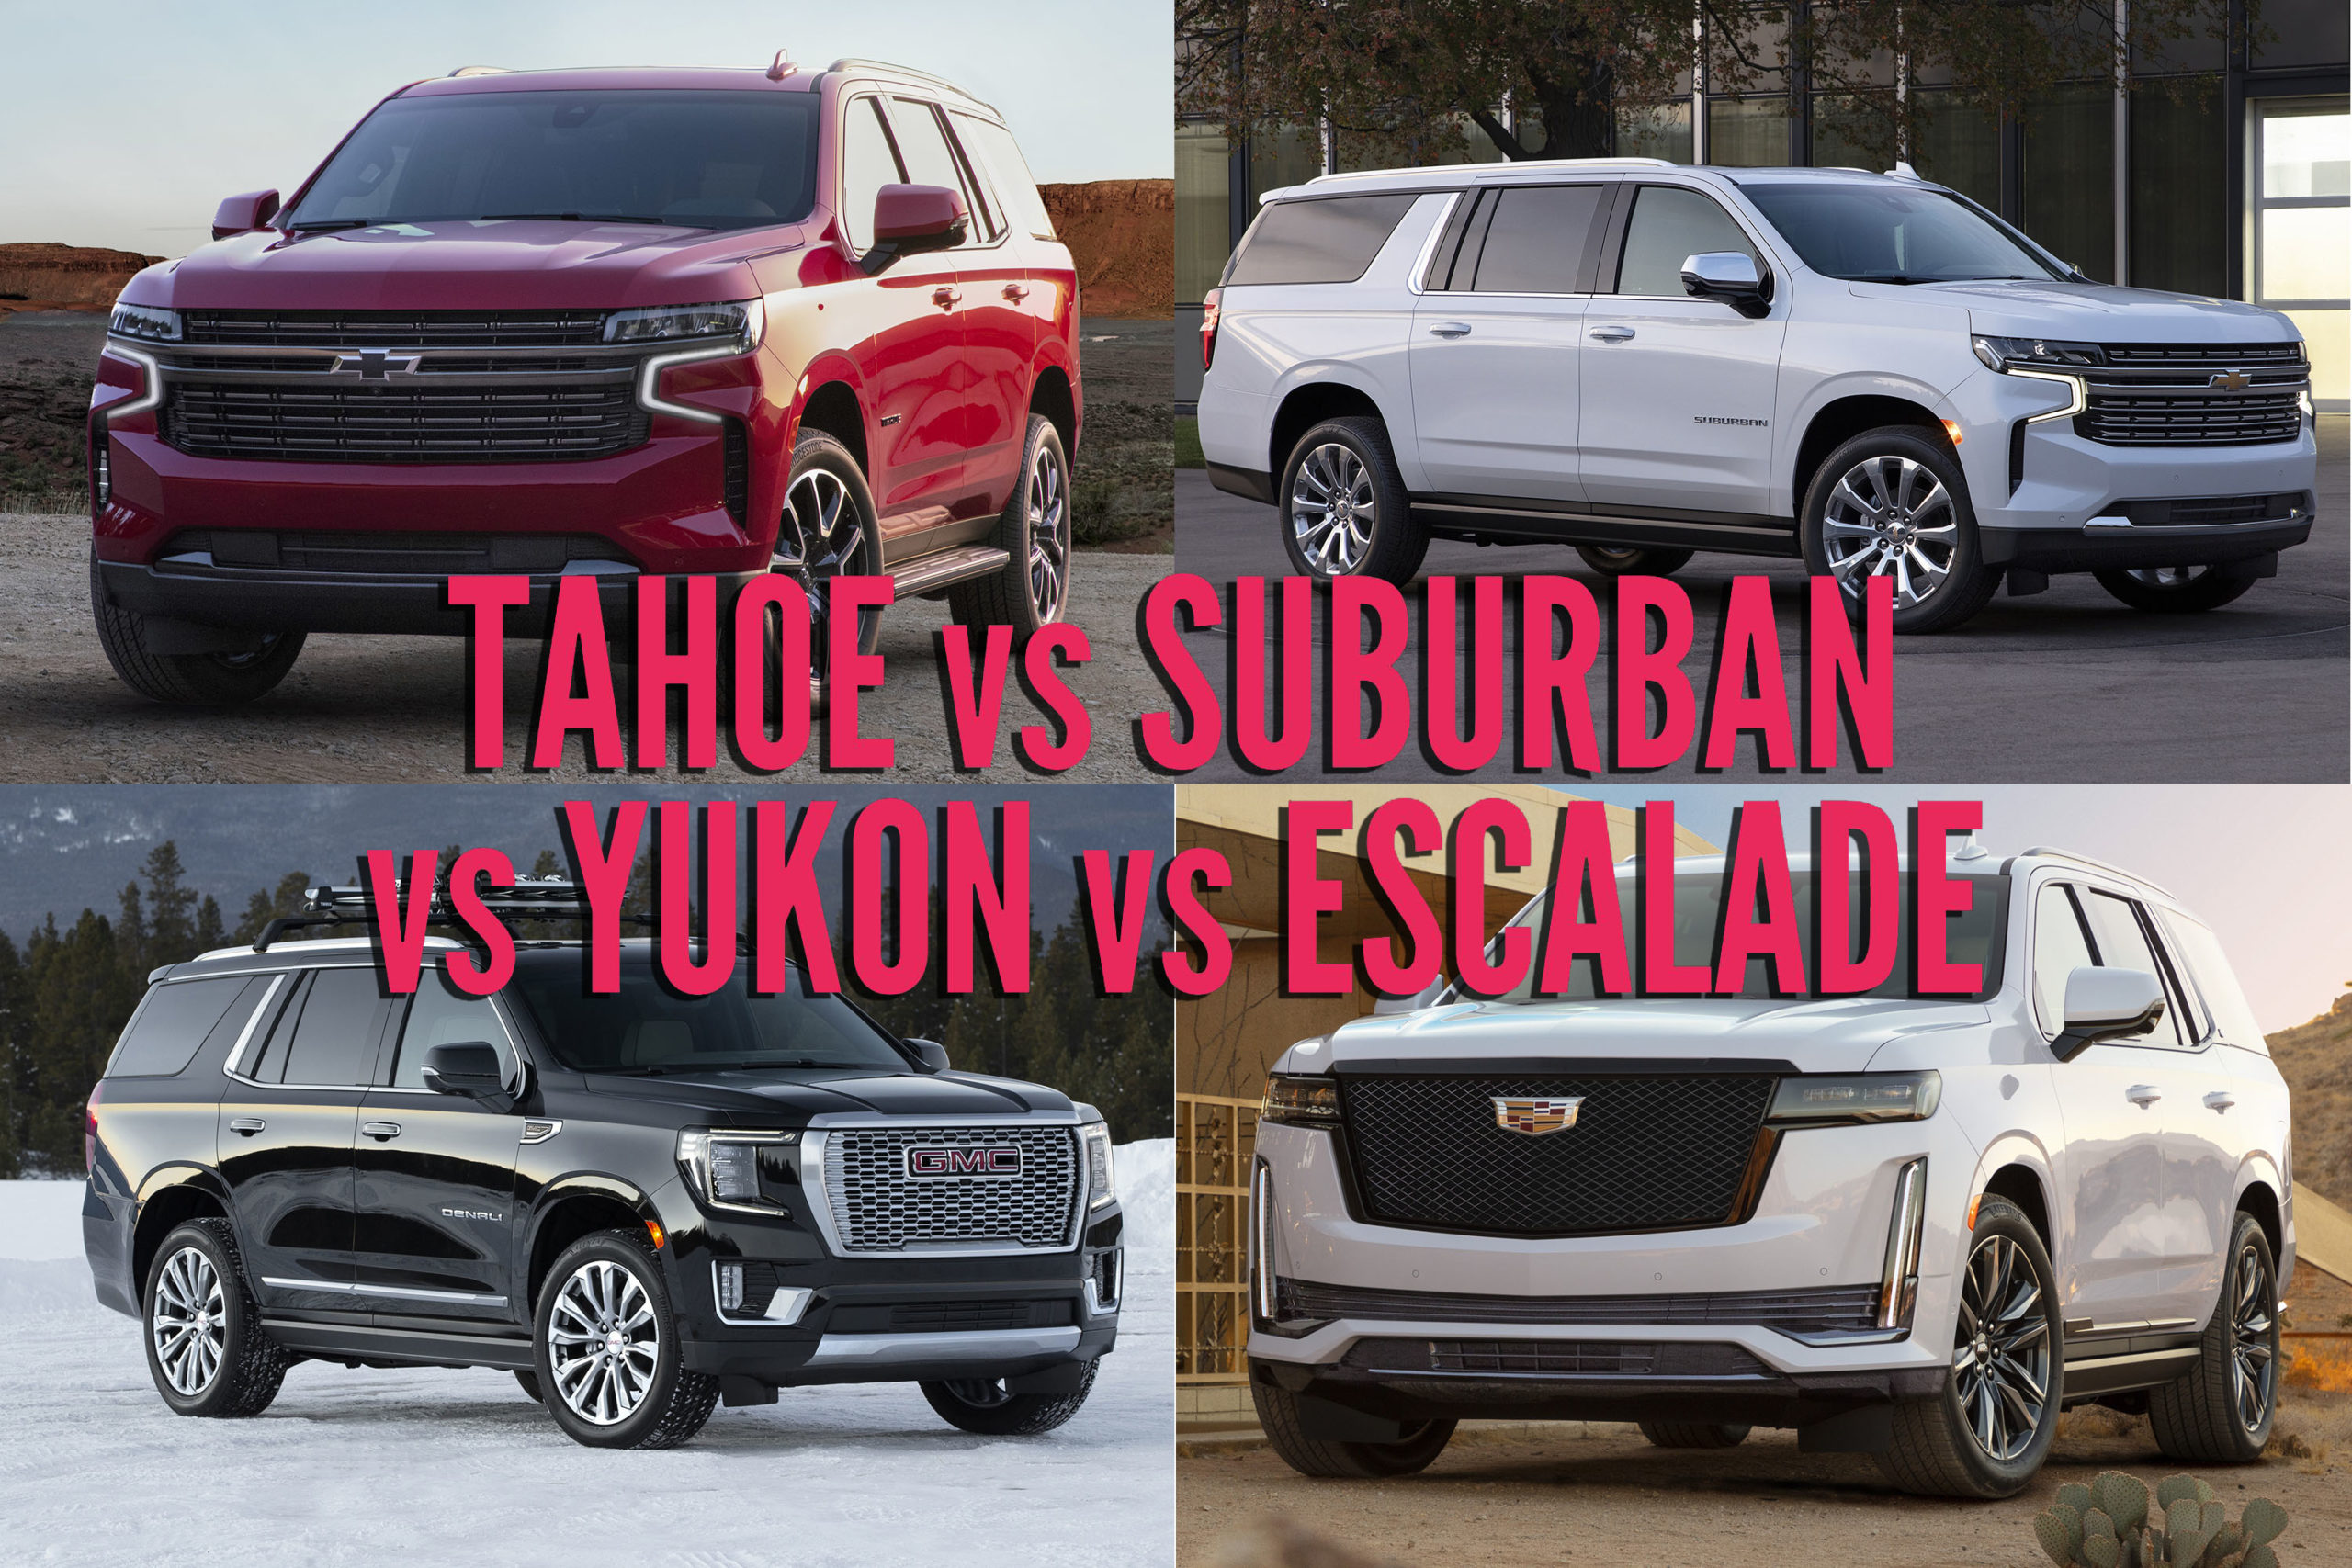 2021 Chevrolet Tahoe Suburban Vs Gmc Yukon Vs Cadillac Escalade